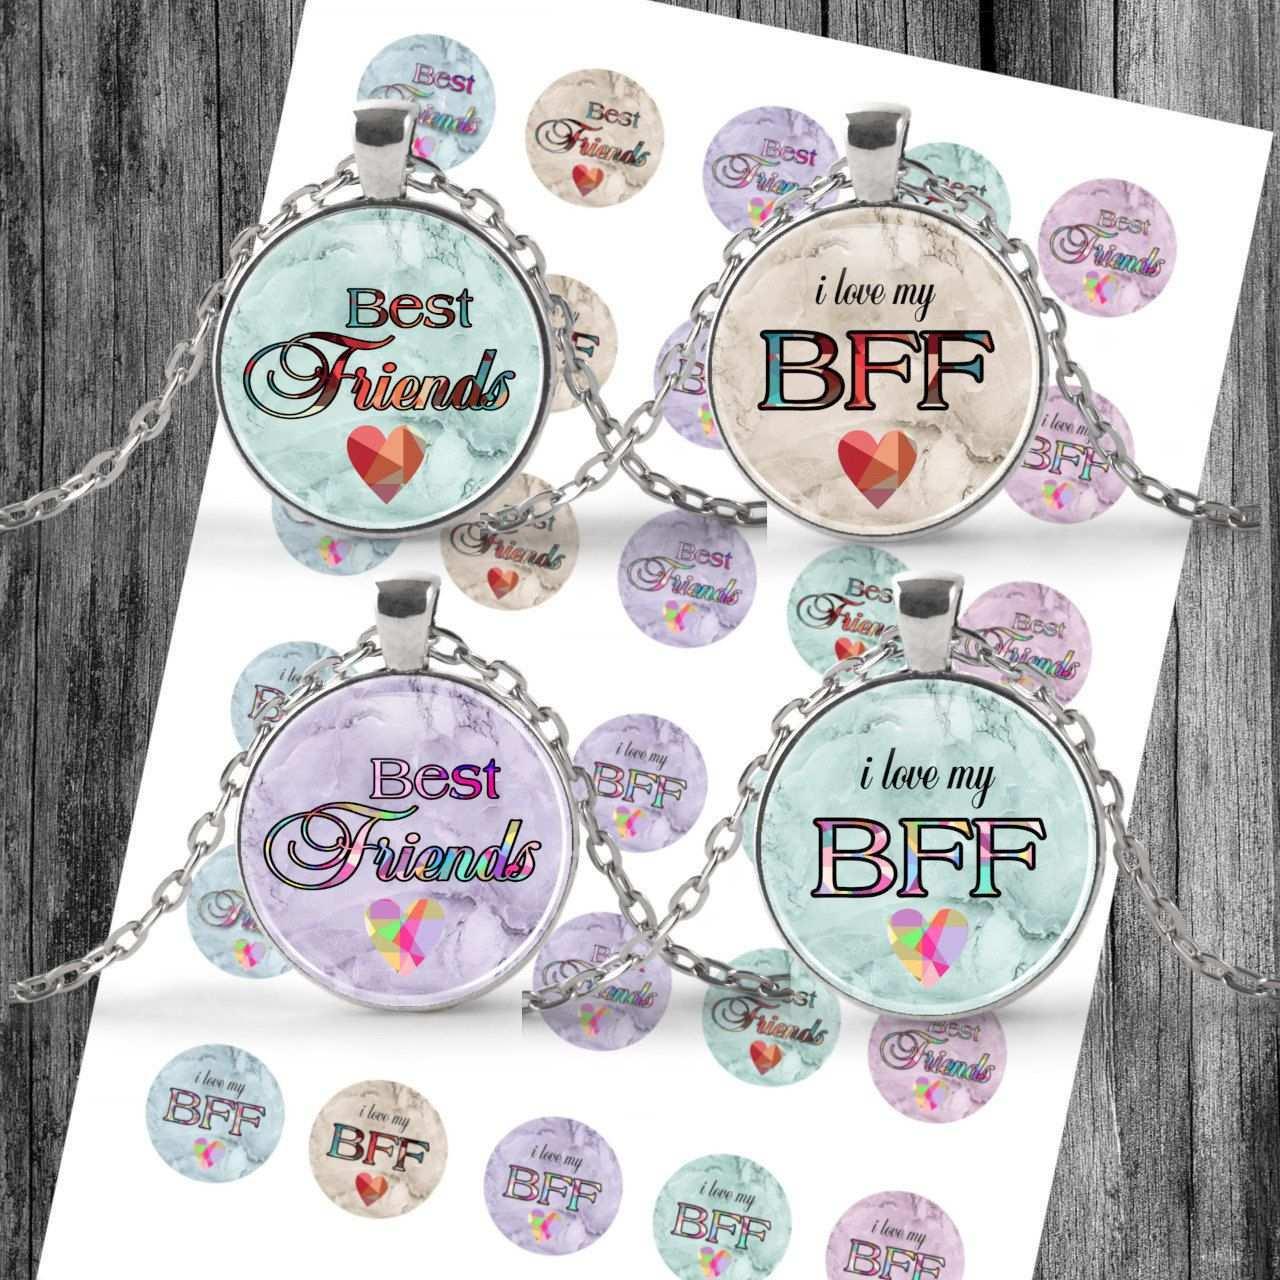 Cabochon Vorlagen Digital Download Template Bff Best Friends Etsy Etsy Etsy Seller I Love My Friends